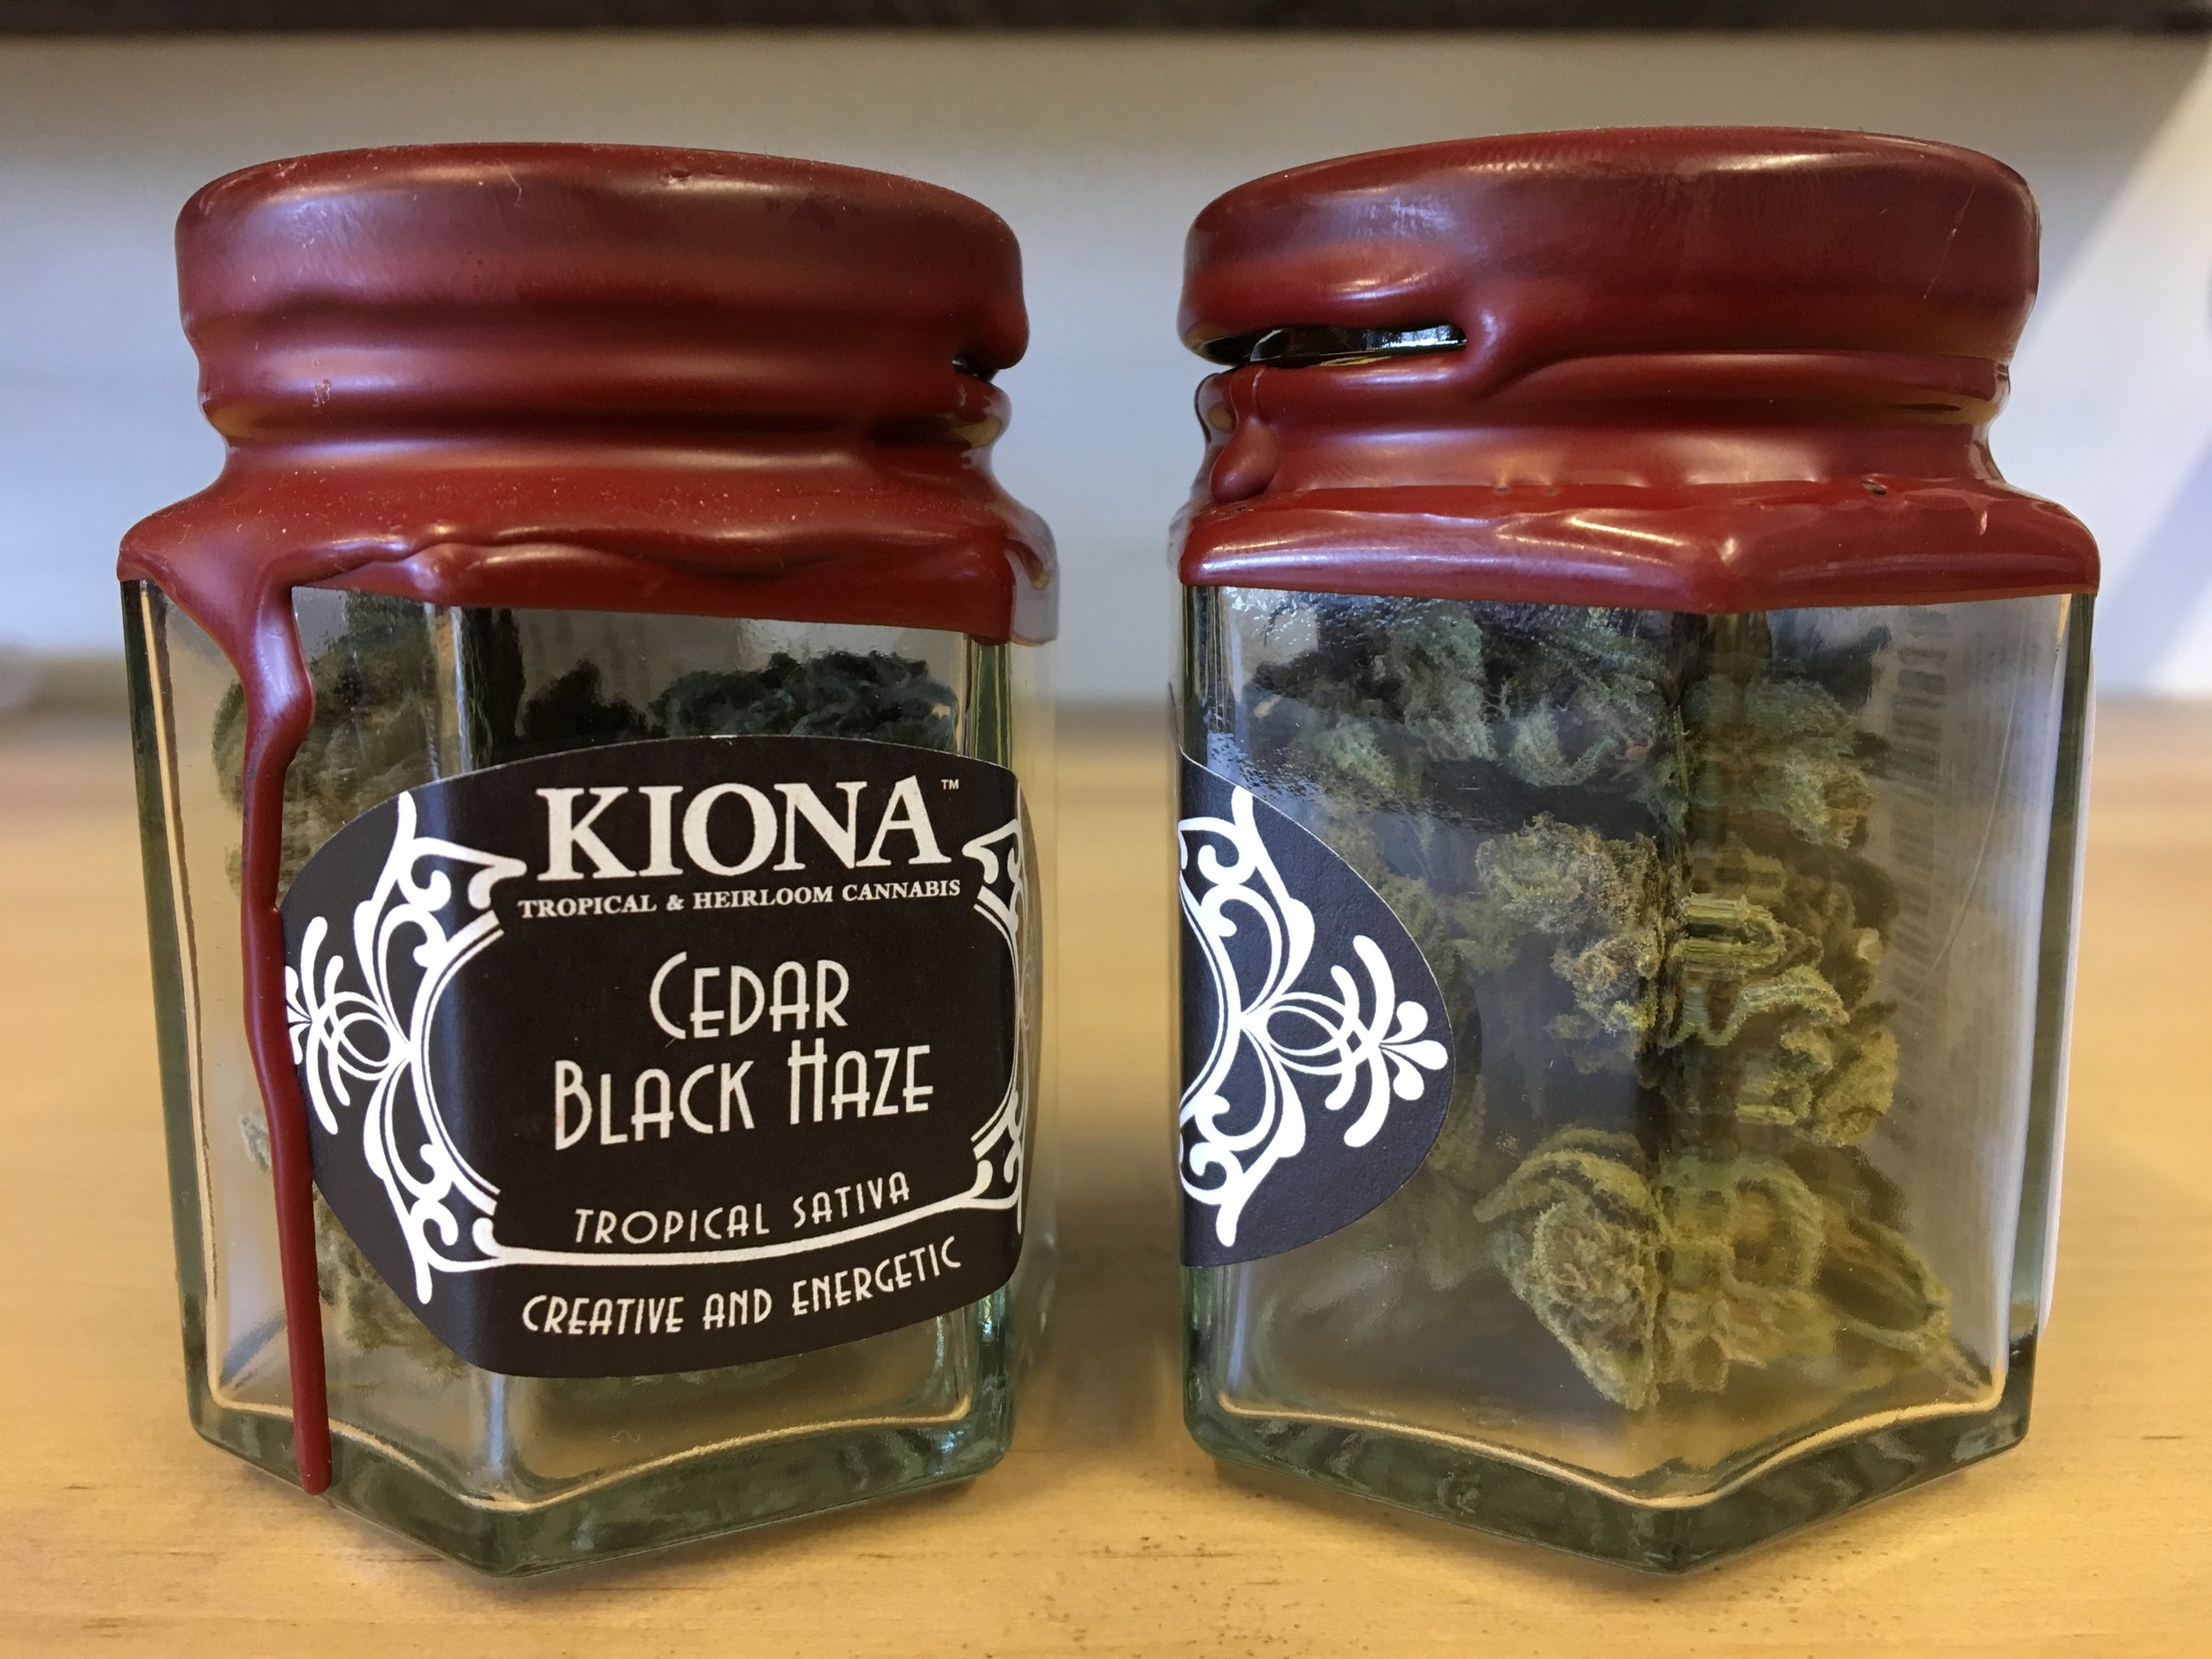 Cedar Black Haze by Kiona based in Benton City, Washington